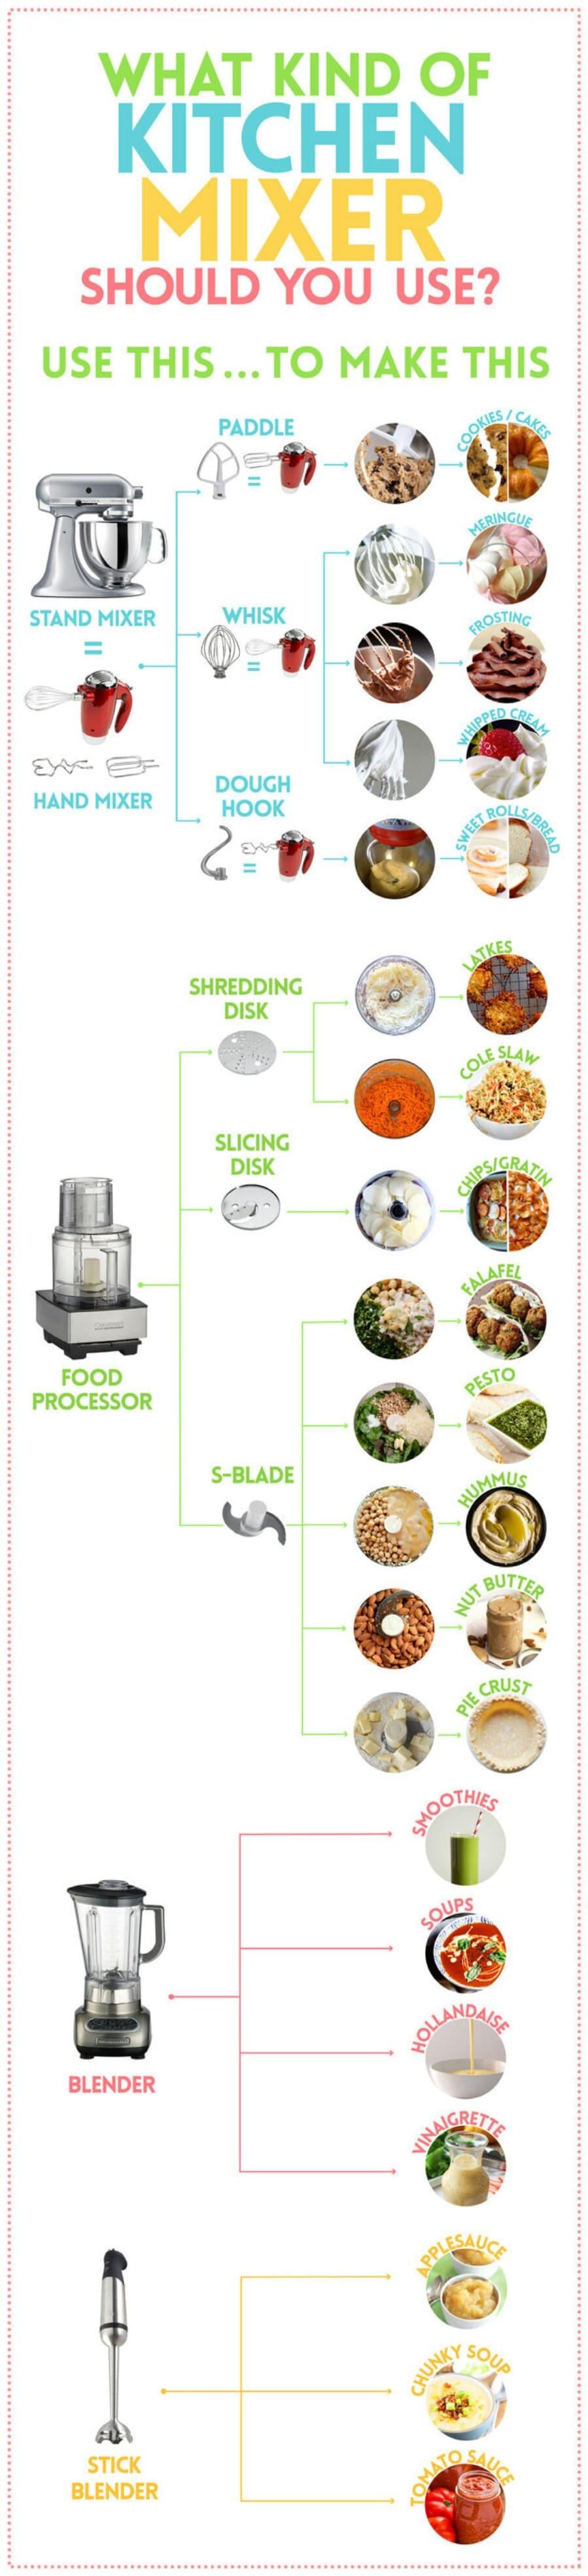 how to use kitchenaid food processor blades